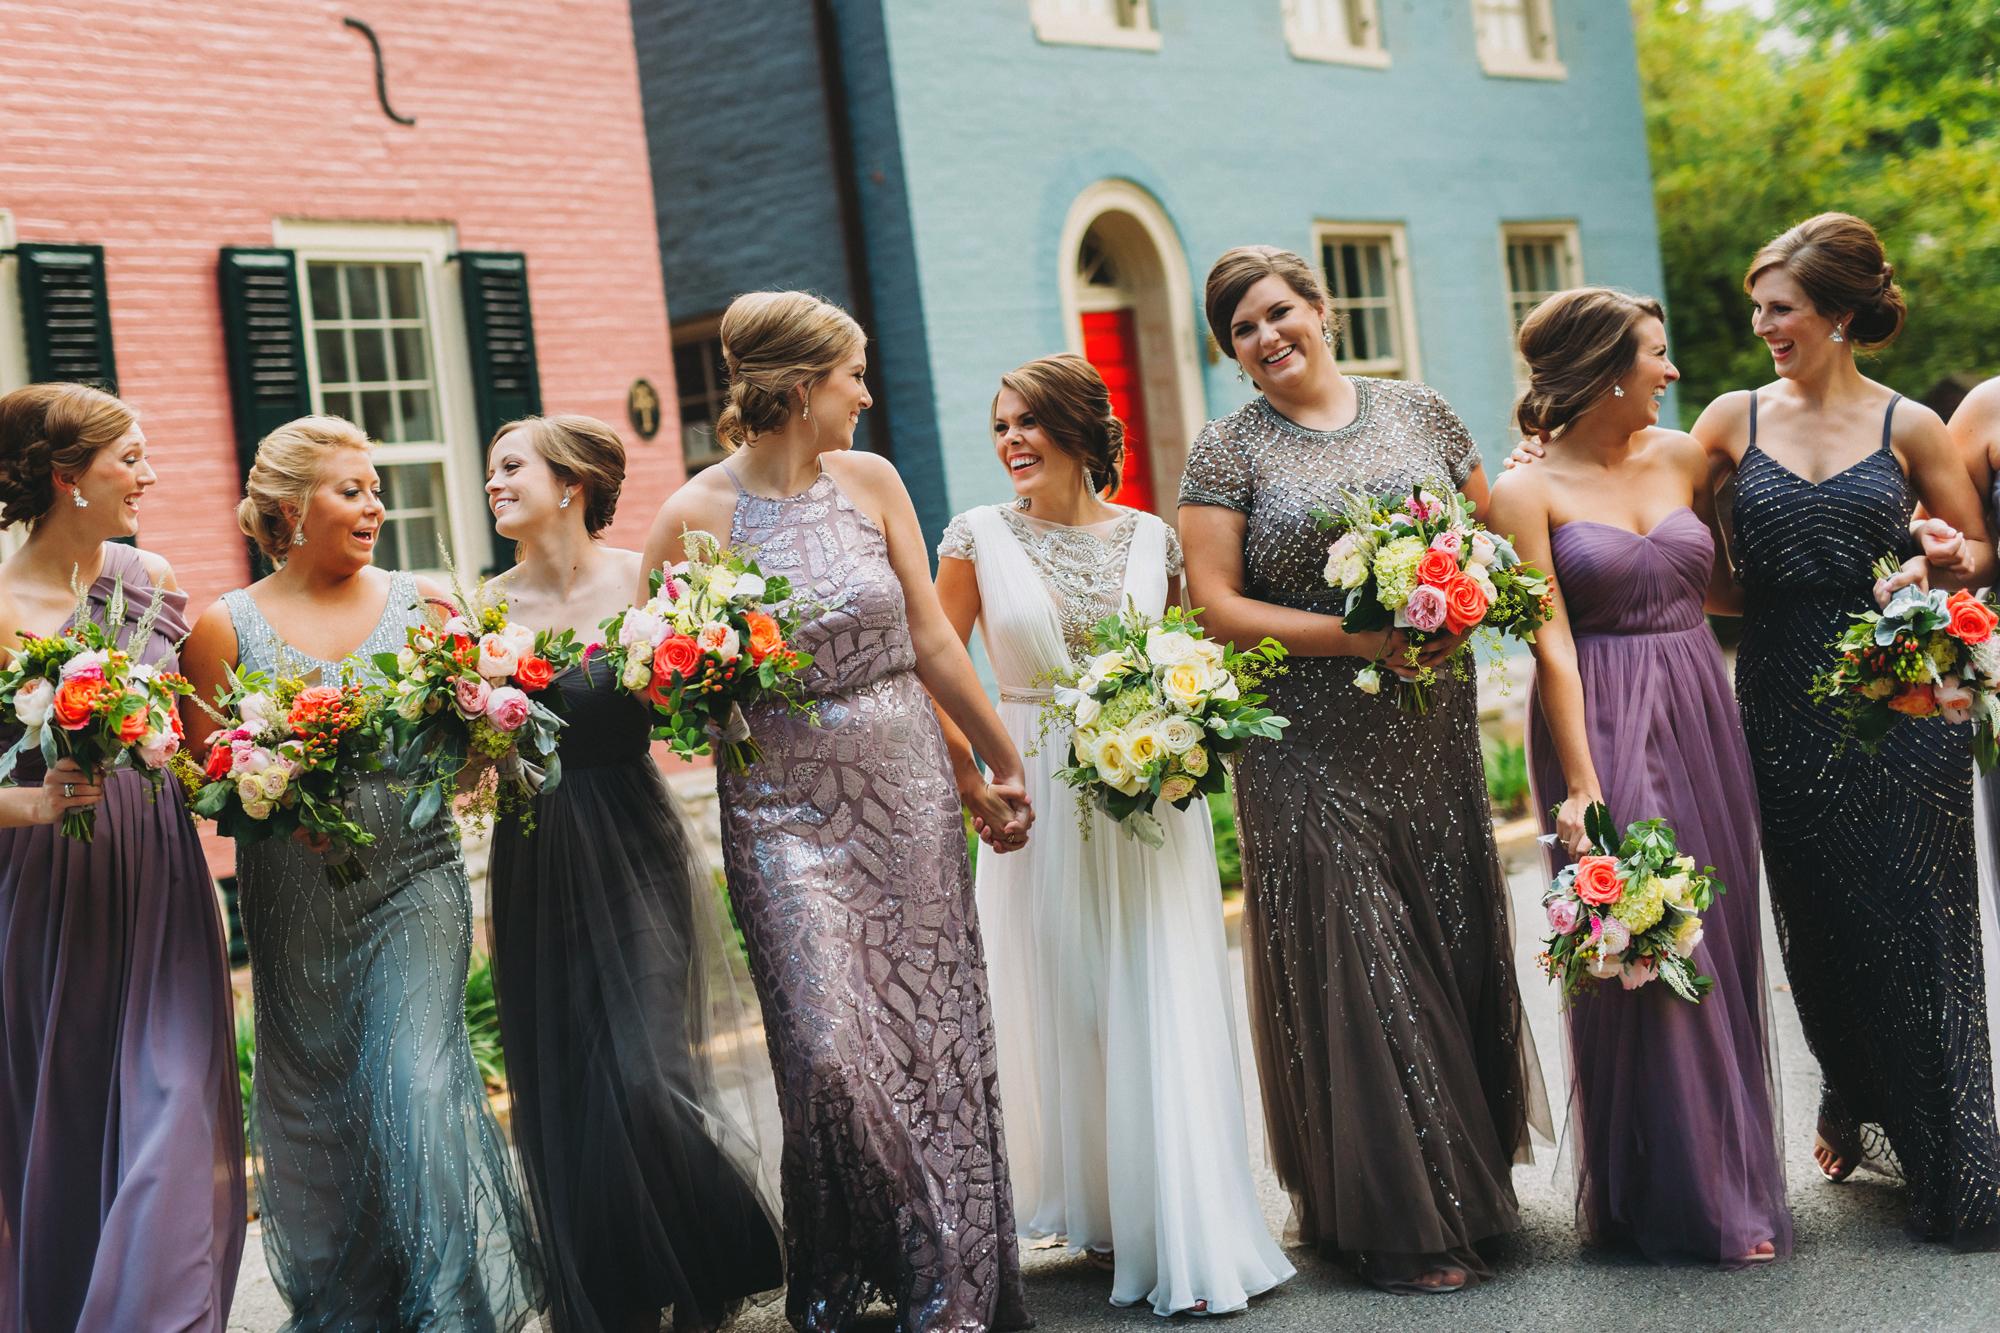 How to mix & match bridesmaids dresses / Mix & Match Bridesmaids Dresses